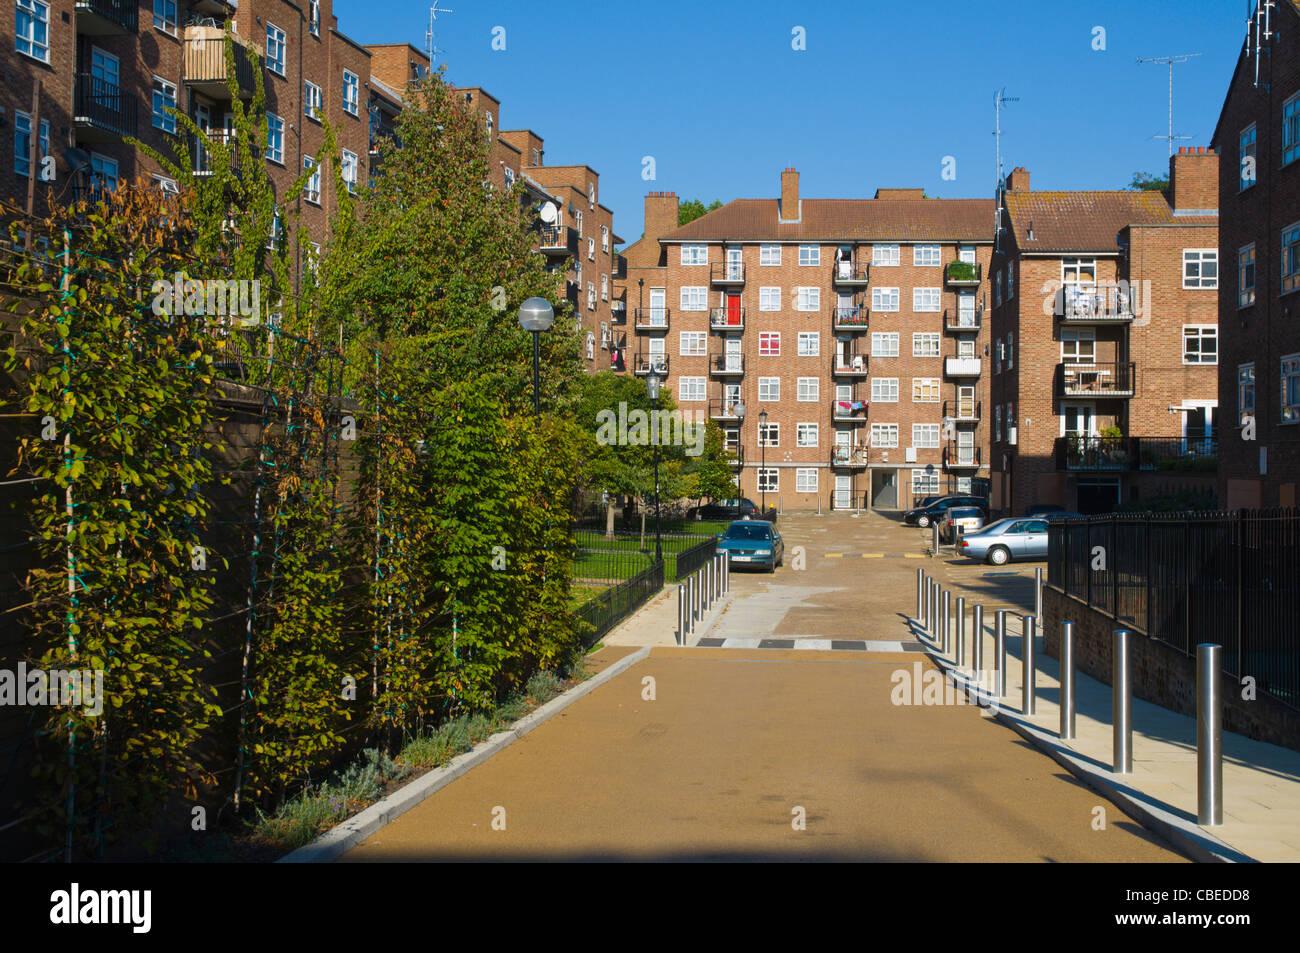 Council estate along Portobello Road street Notting Hill district North Kensington west London England UK Europe - Stock Image